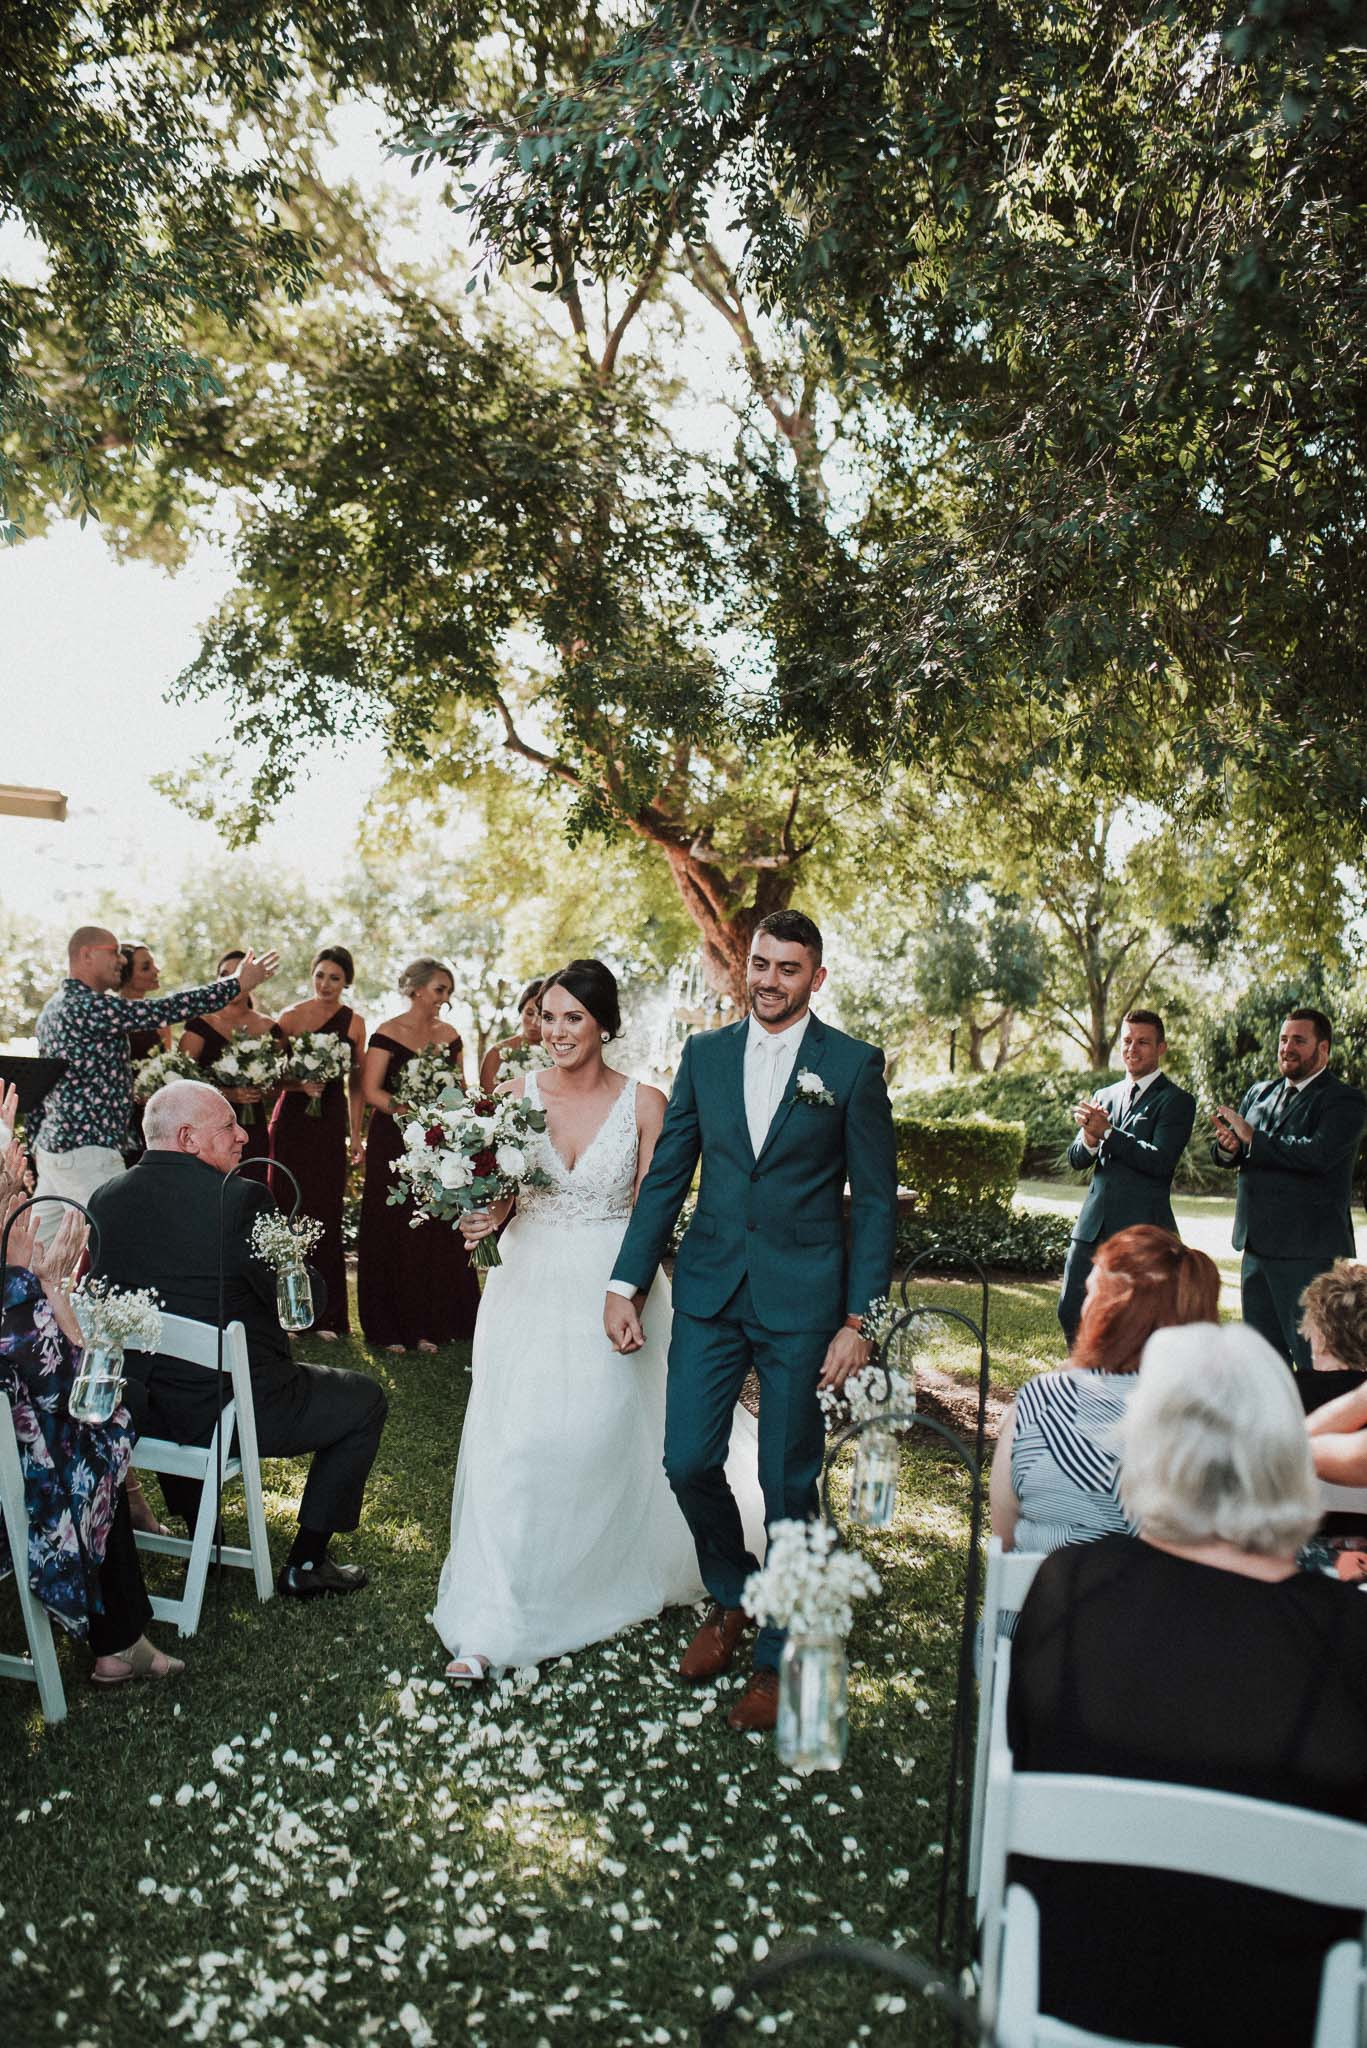 MECURE-RESORT-WEDDING-KING-WEB-100.jpg